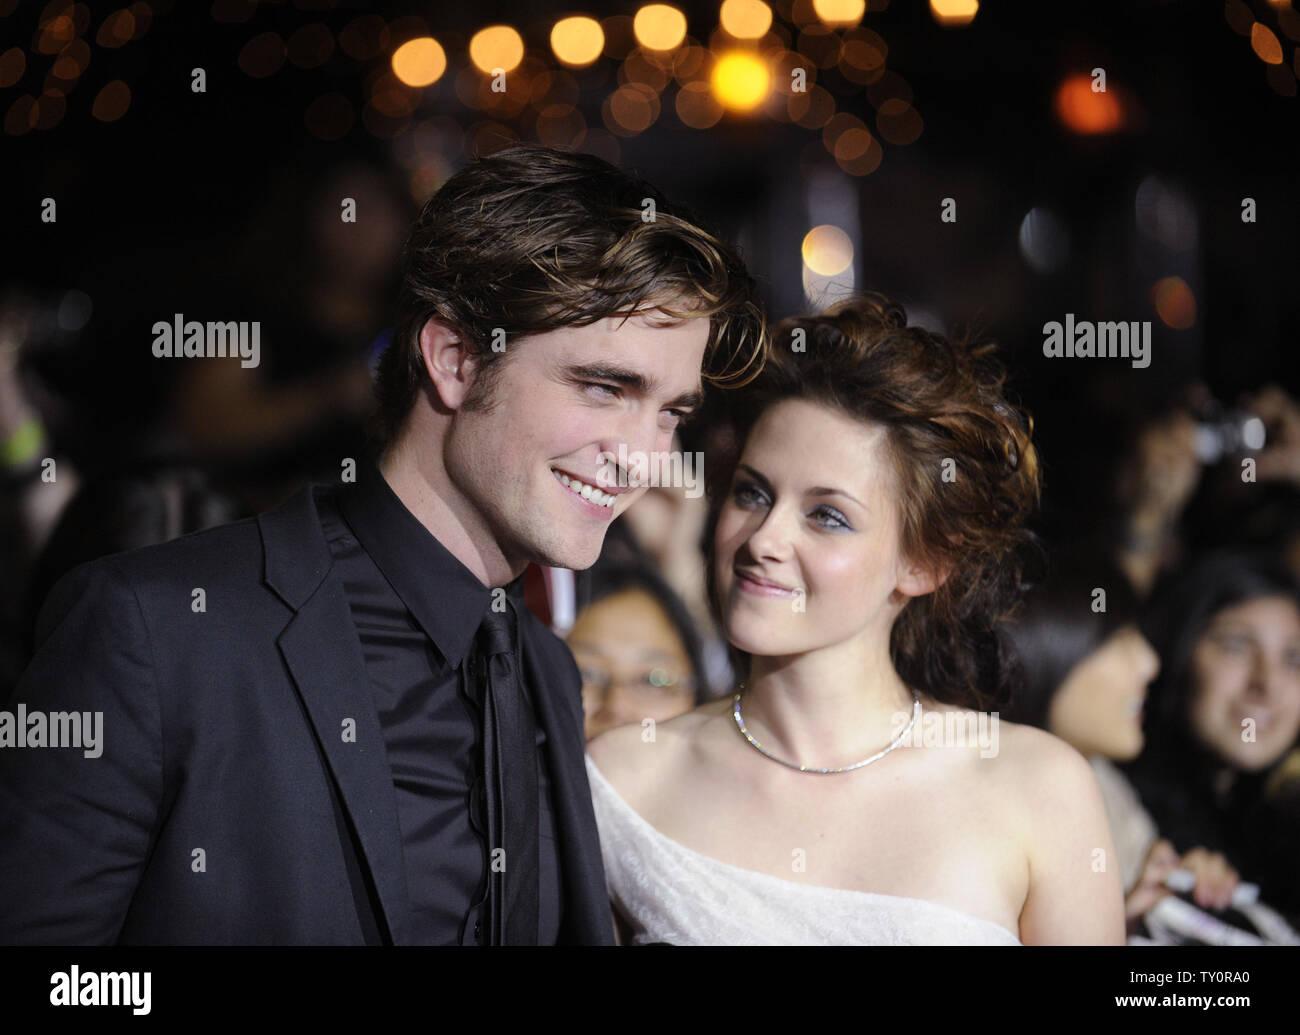 Twilight cast medlemmer dating